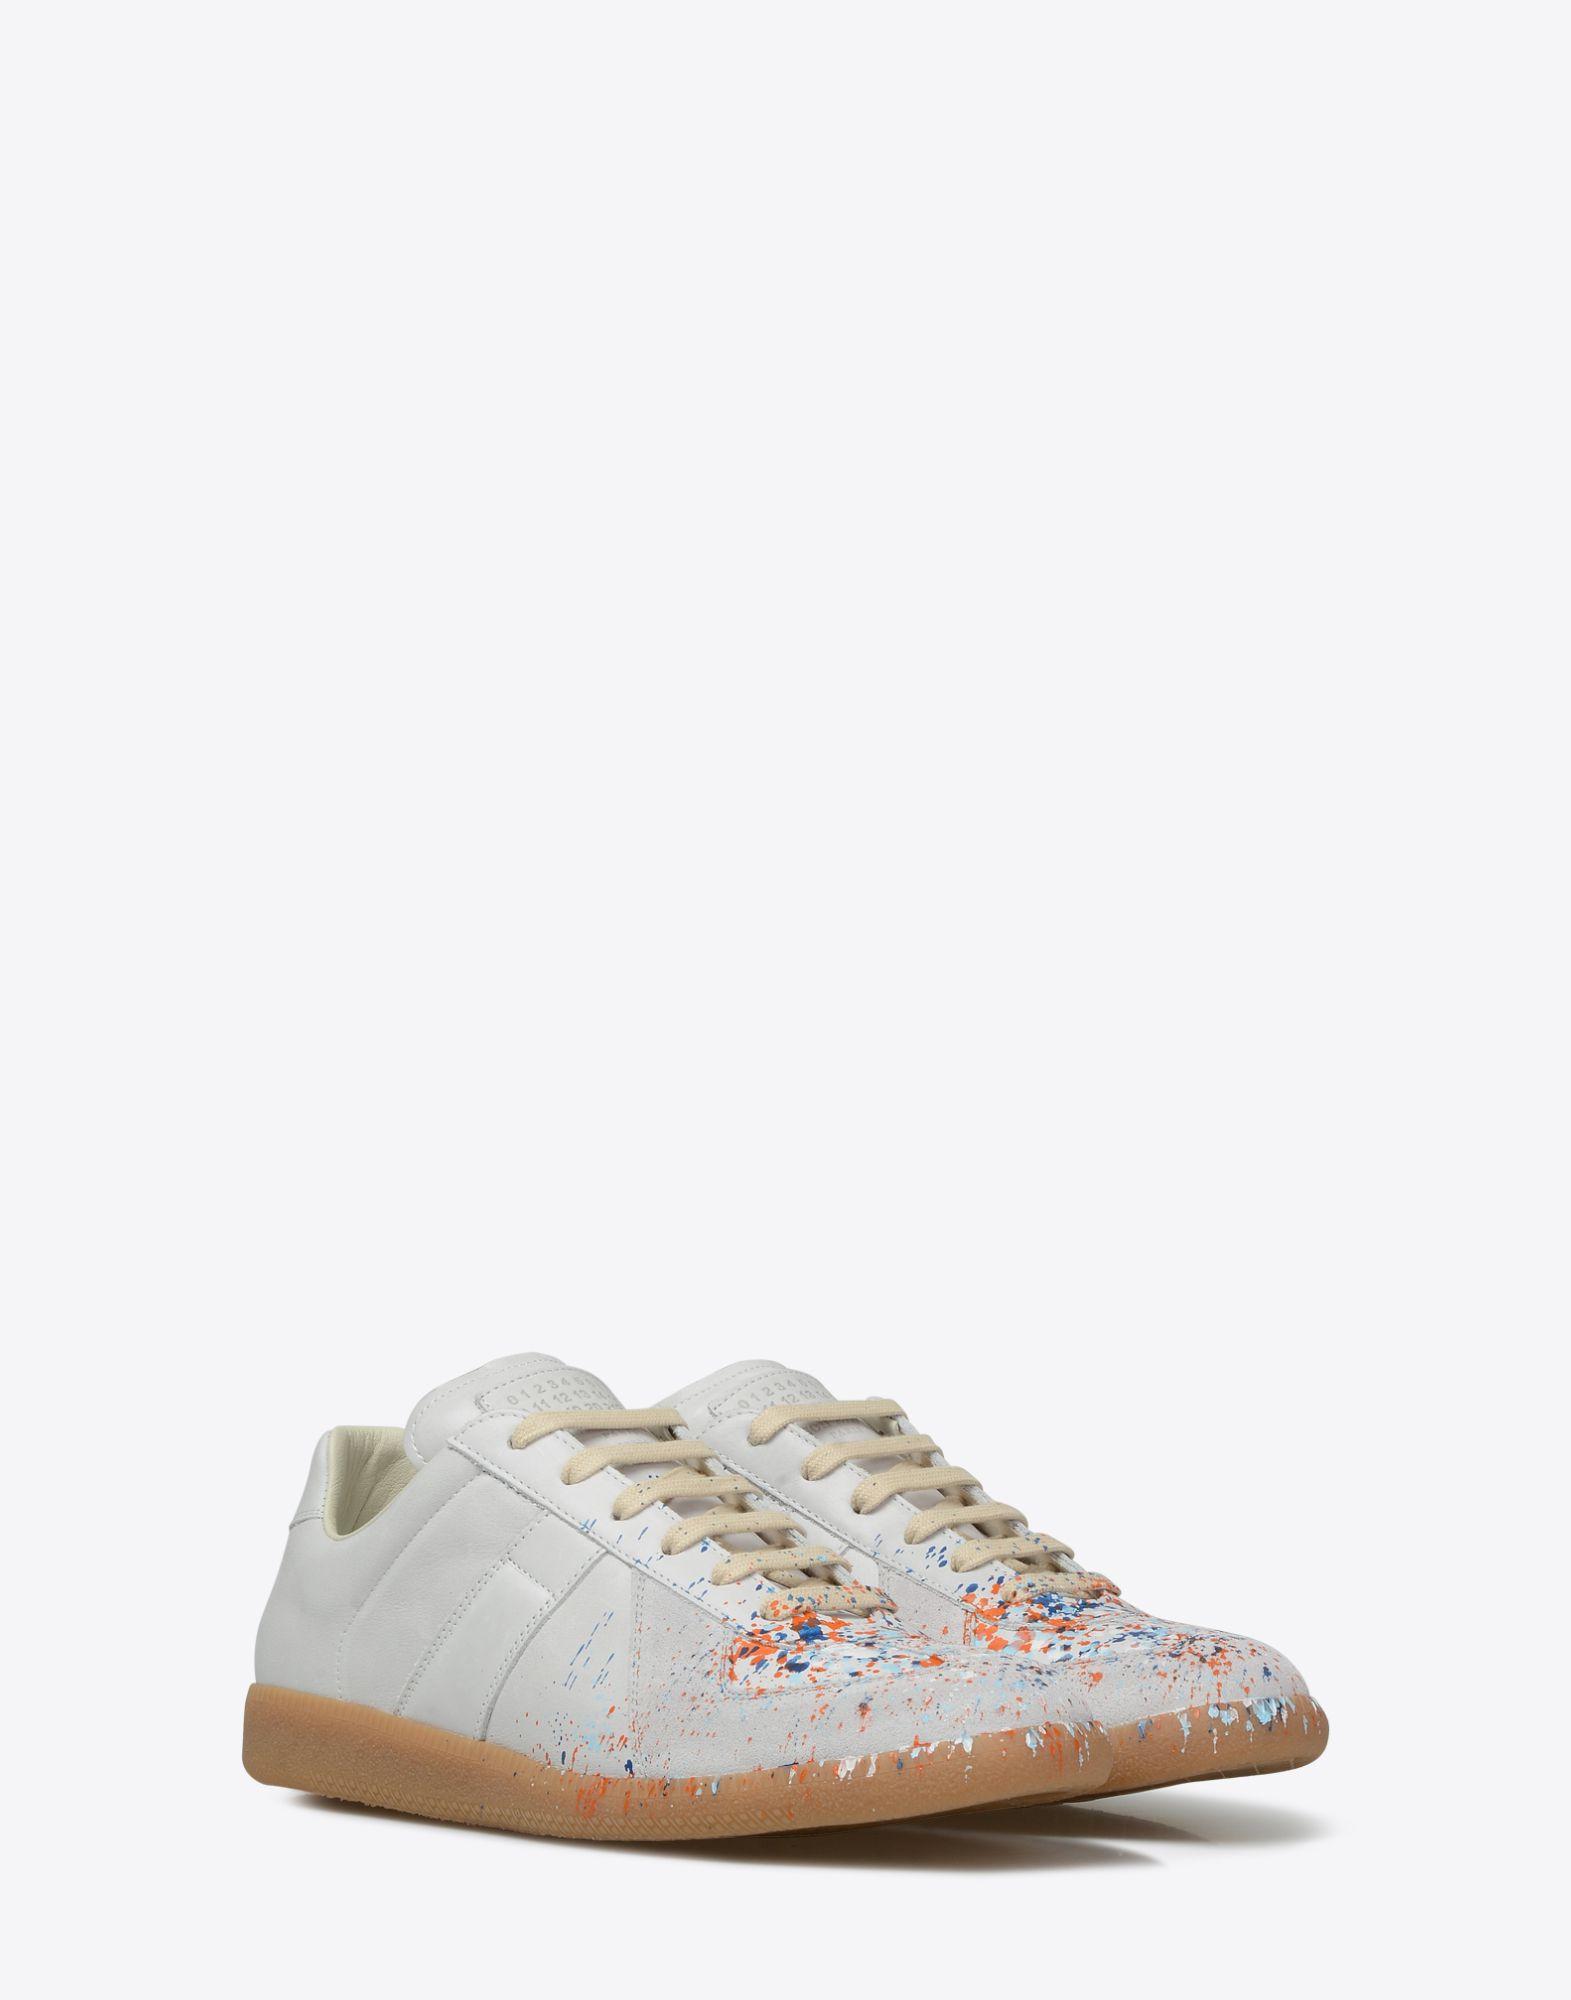 9fe78b8df08 Maison Margiela'Replica' Paint Drop Sneakers Men | Maison Margiela Store